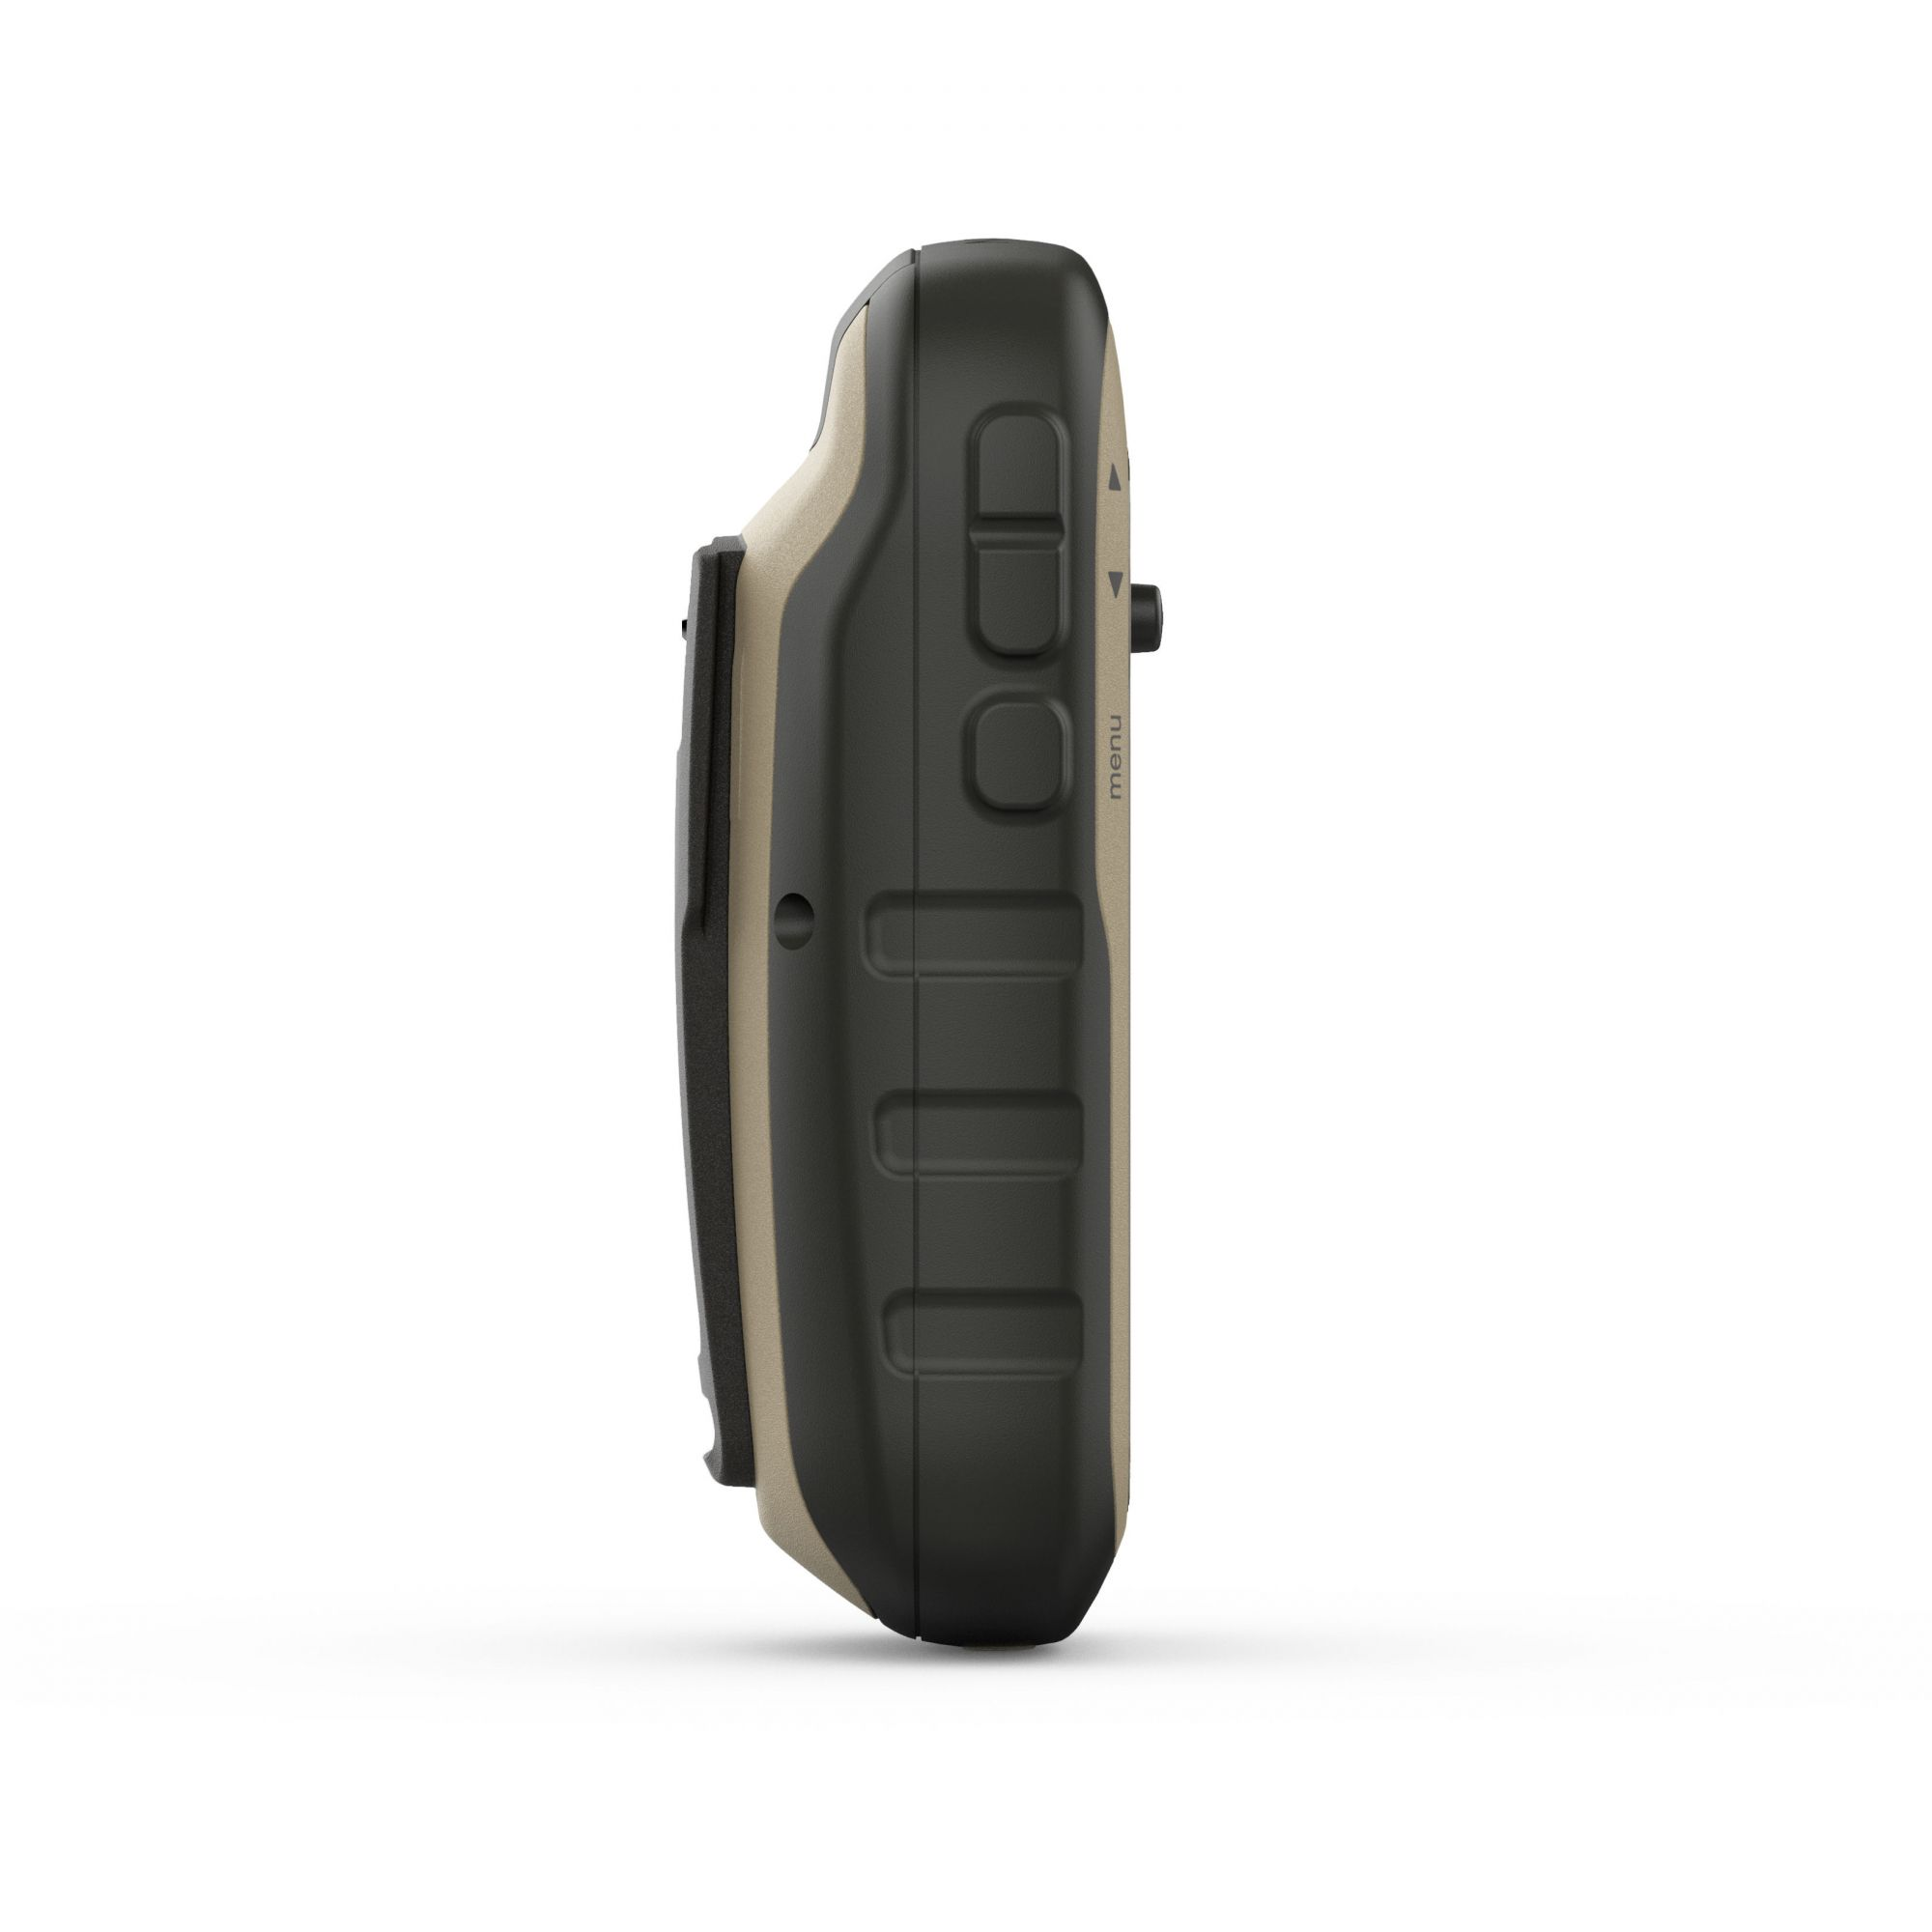 GPS Portátil Garmin eTrex 32x